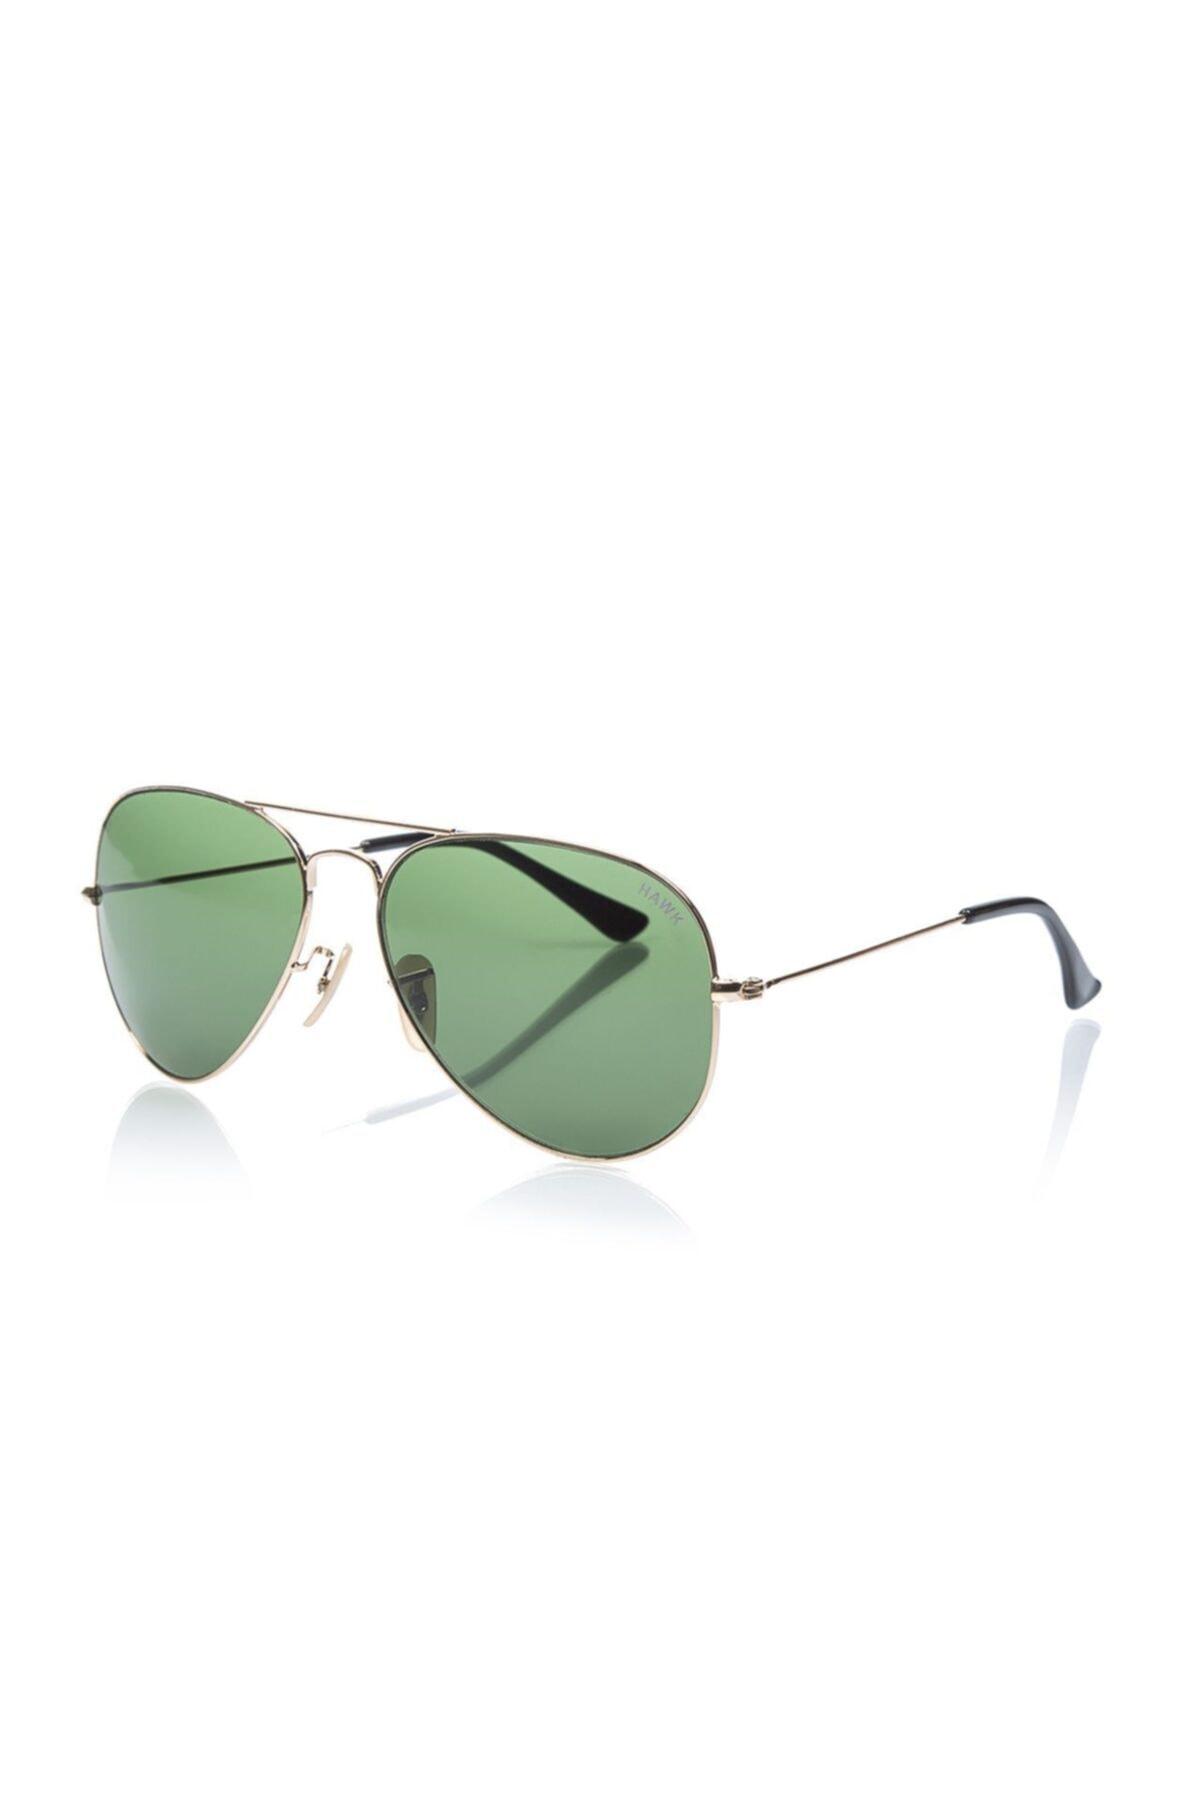 فروش عینک آفتابی اسپرت جدید برند HAWK کد ty4946383